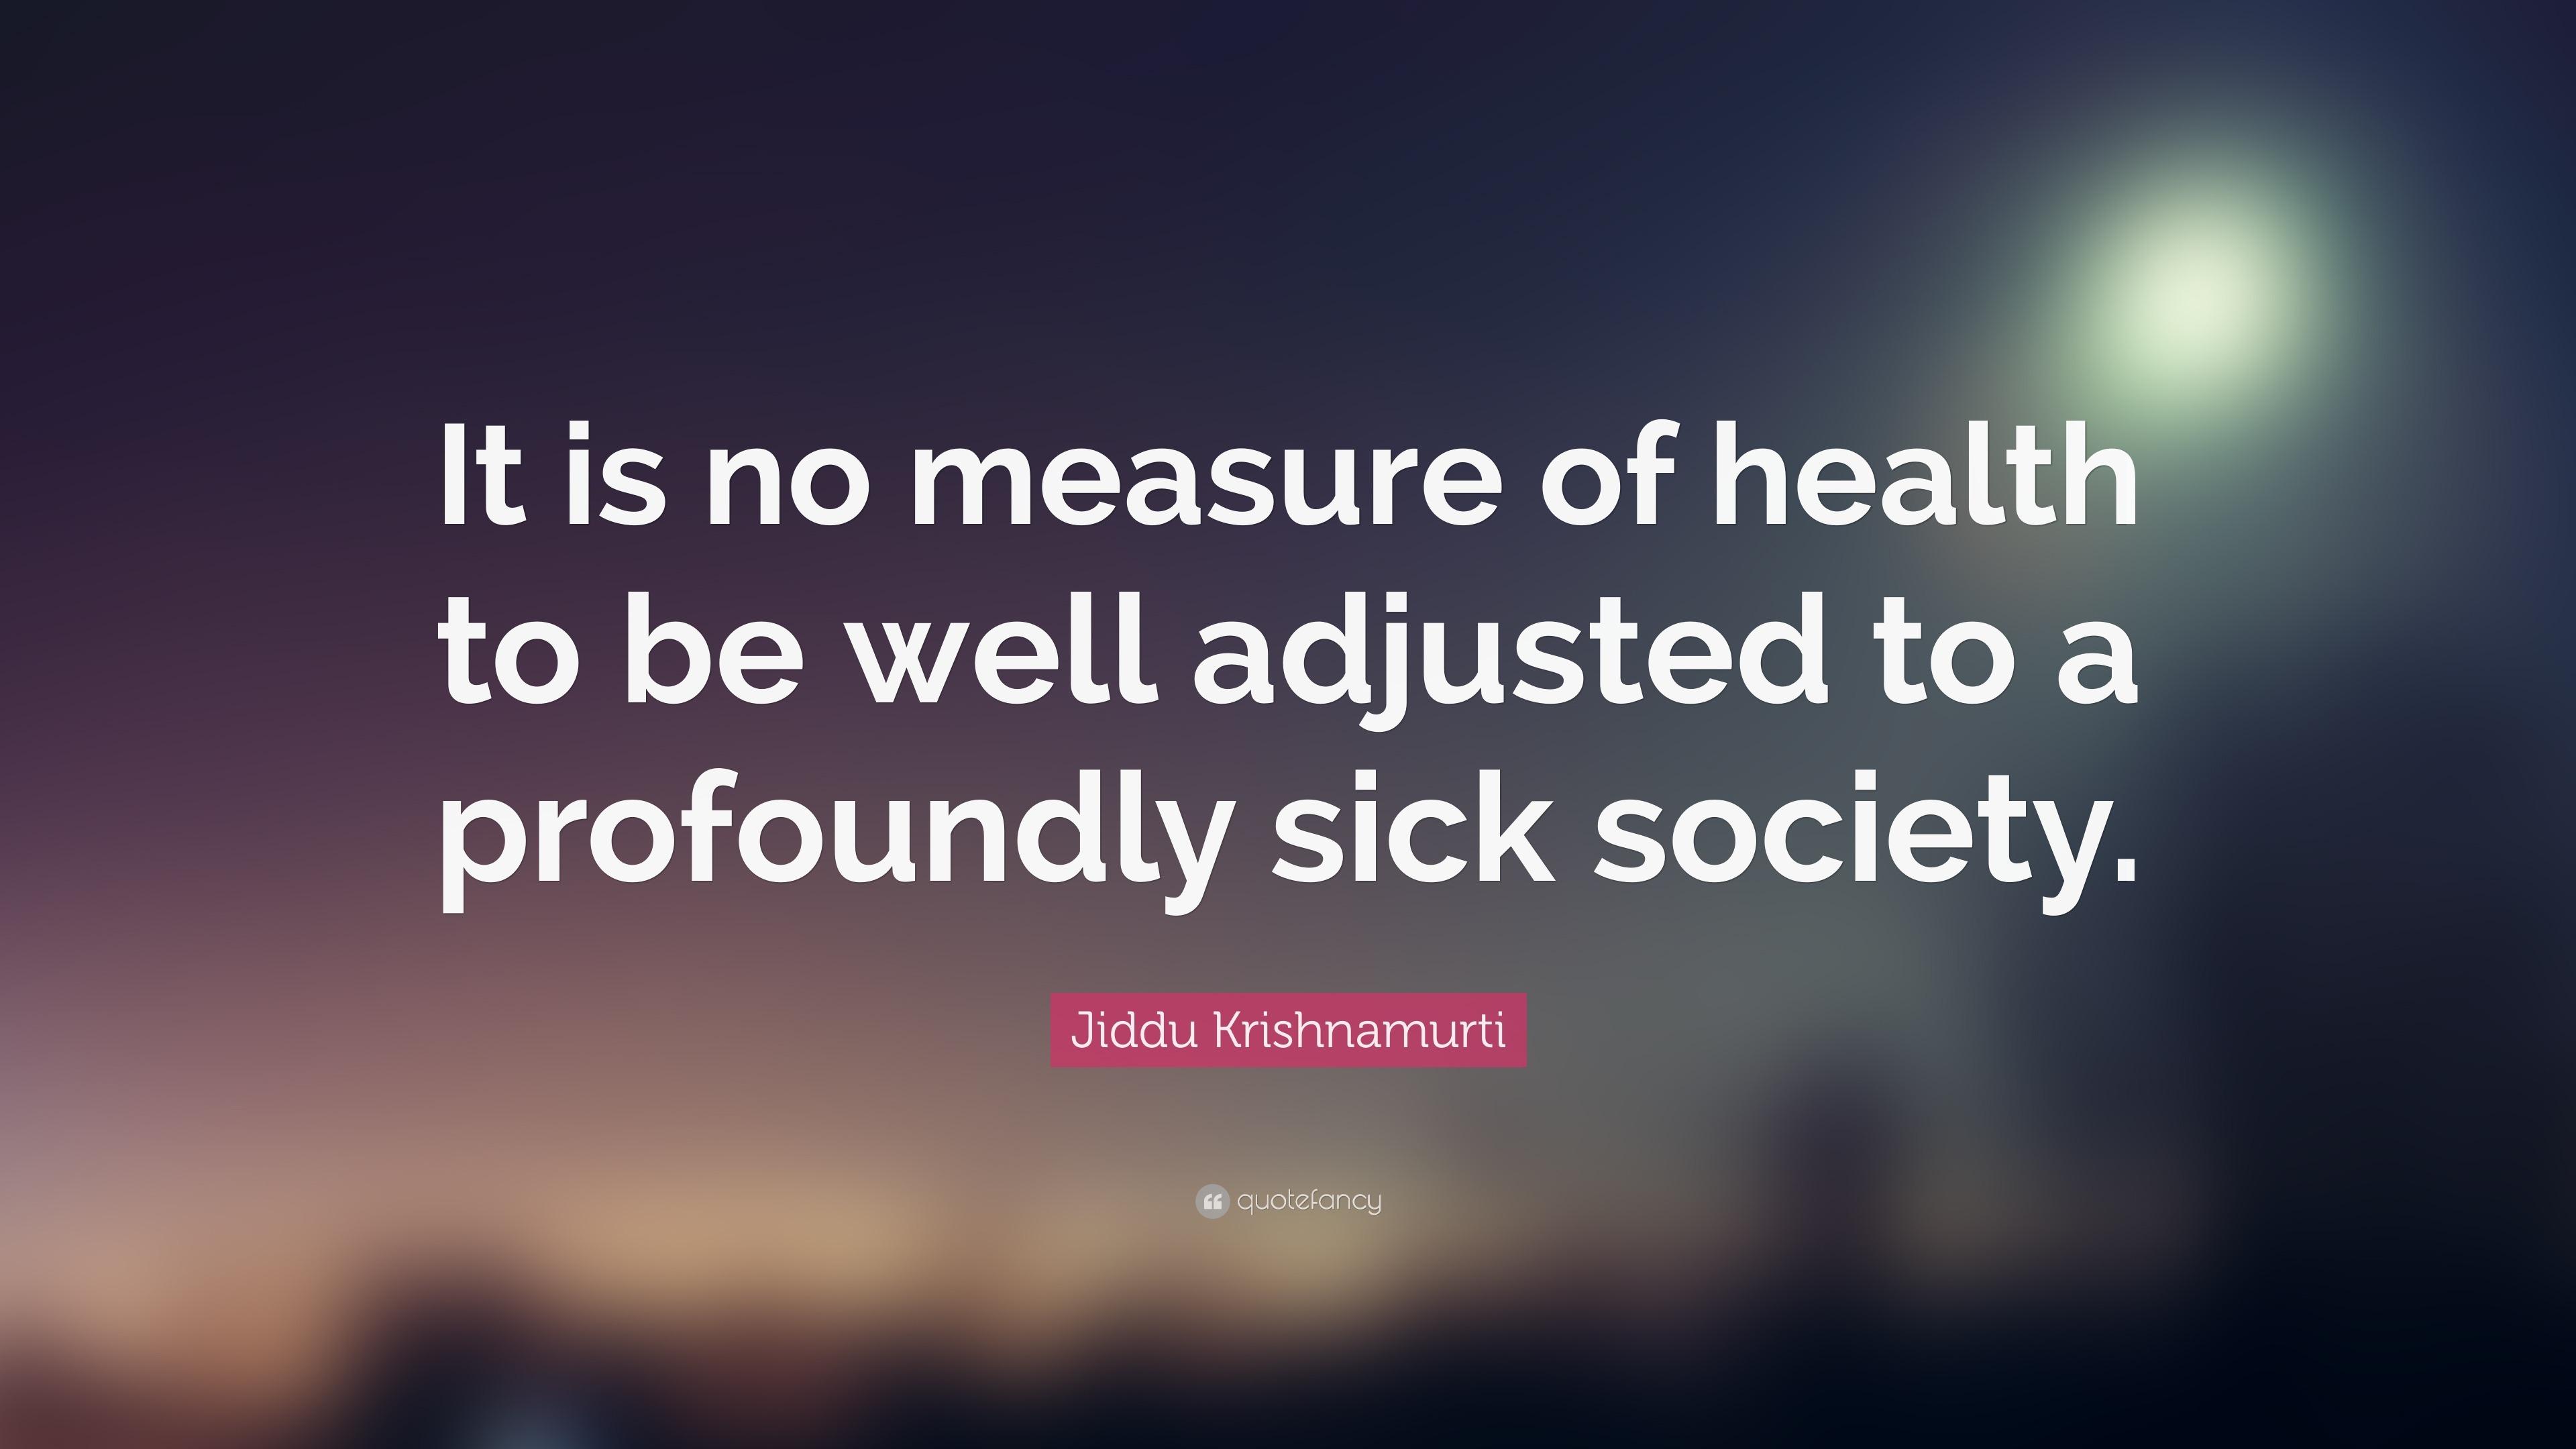 Wallpaper Of Yoga Quote Jiddu Krishnamurti Quote It Is No Measure Of Health To